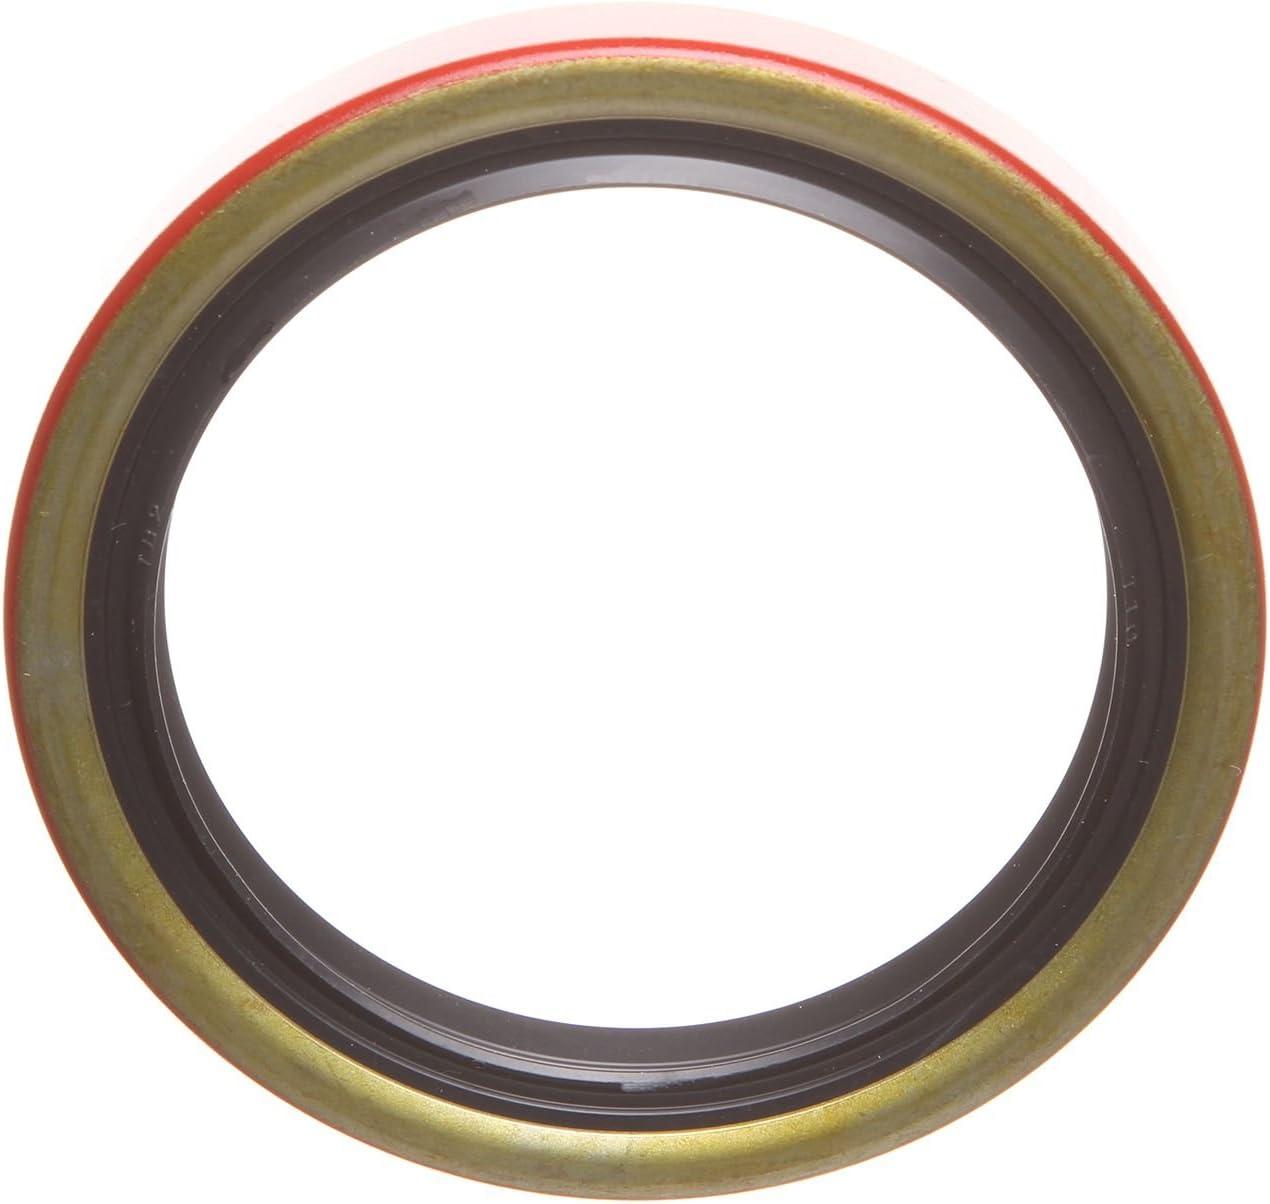 REPLACEMENTKITS.COM Axle Seal Bobcat Replaces Skid Steers Sale item Superlatite 665822